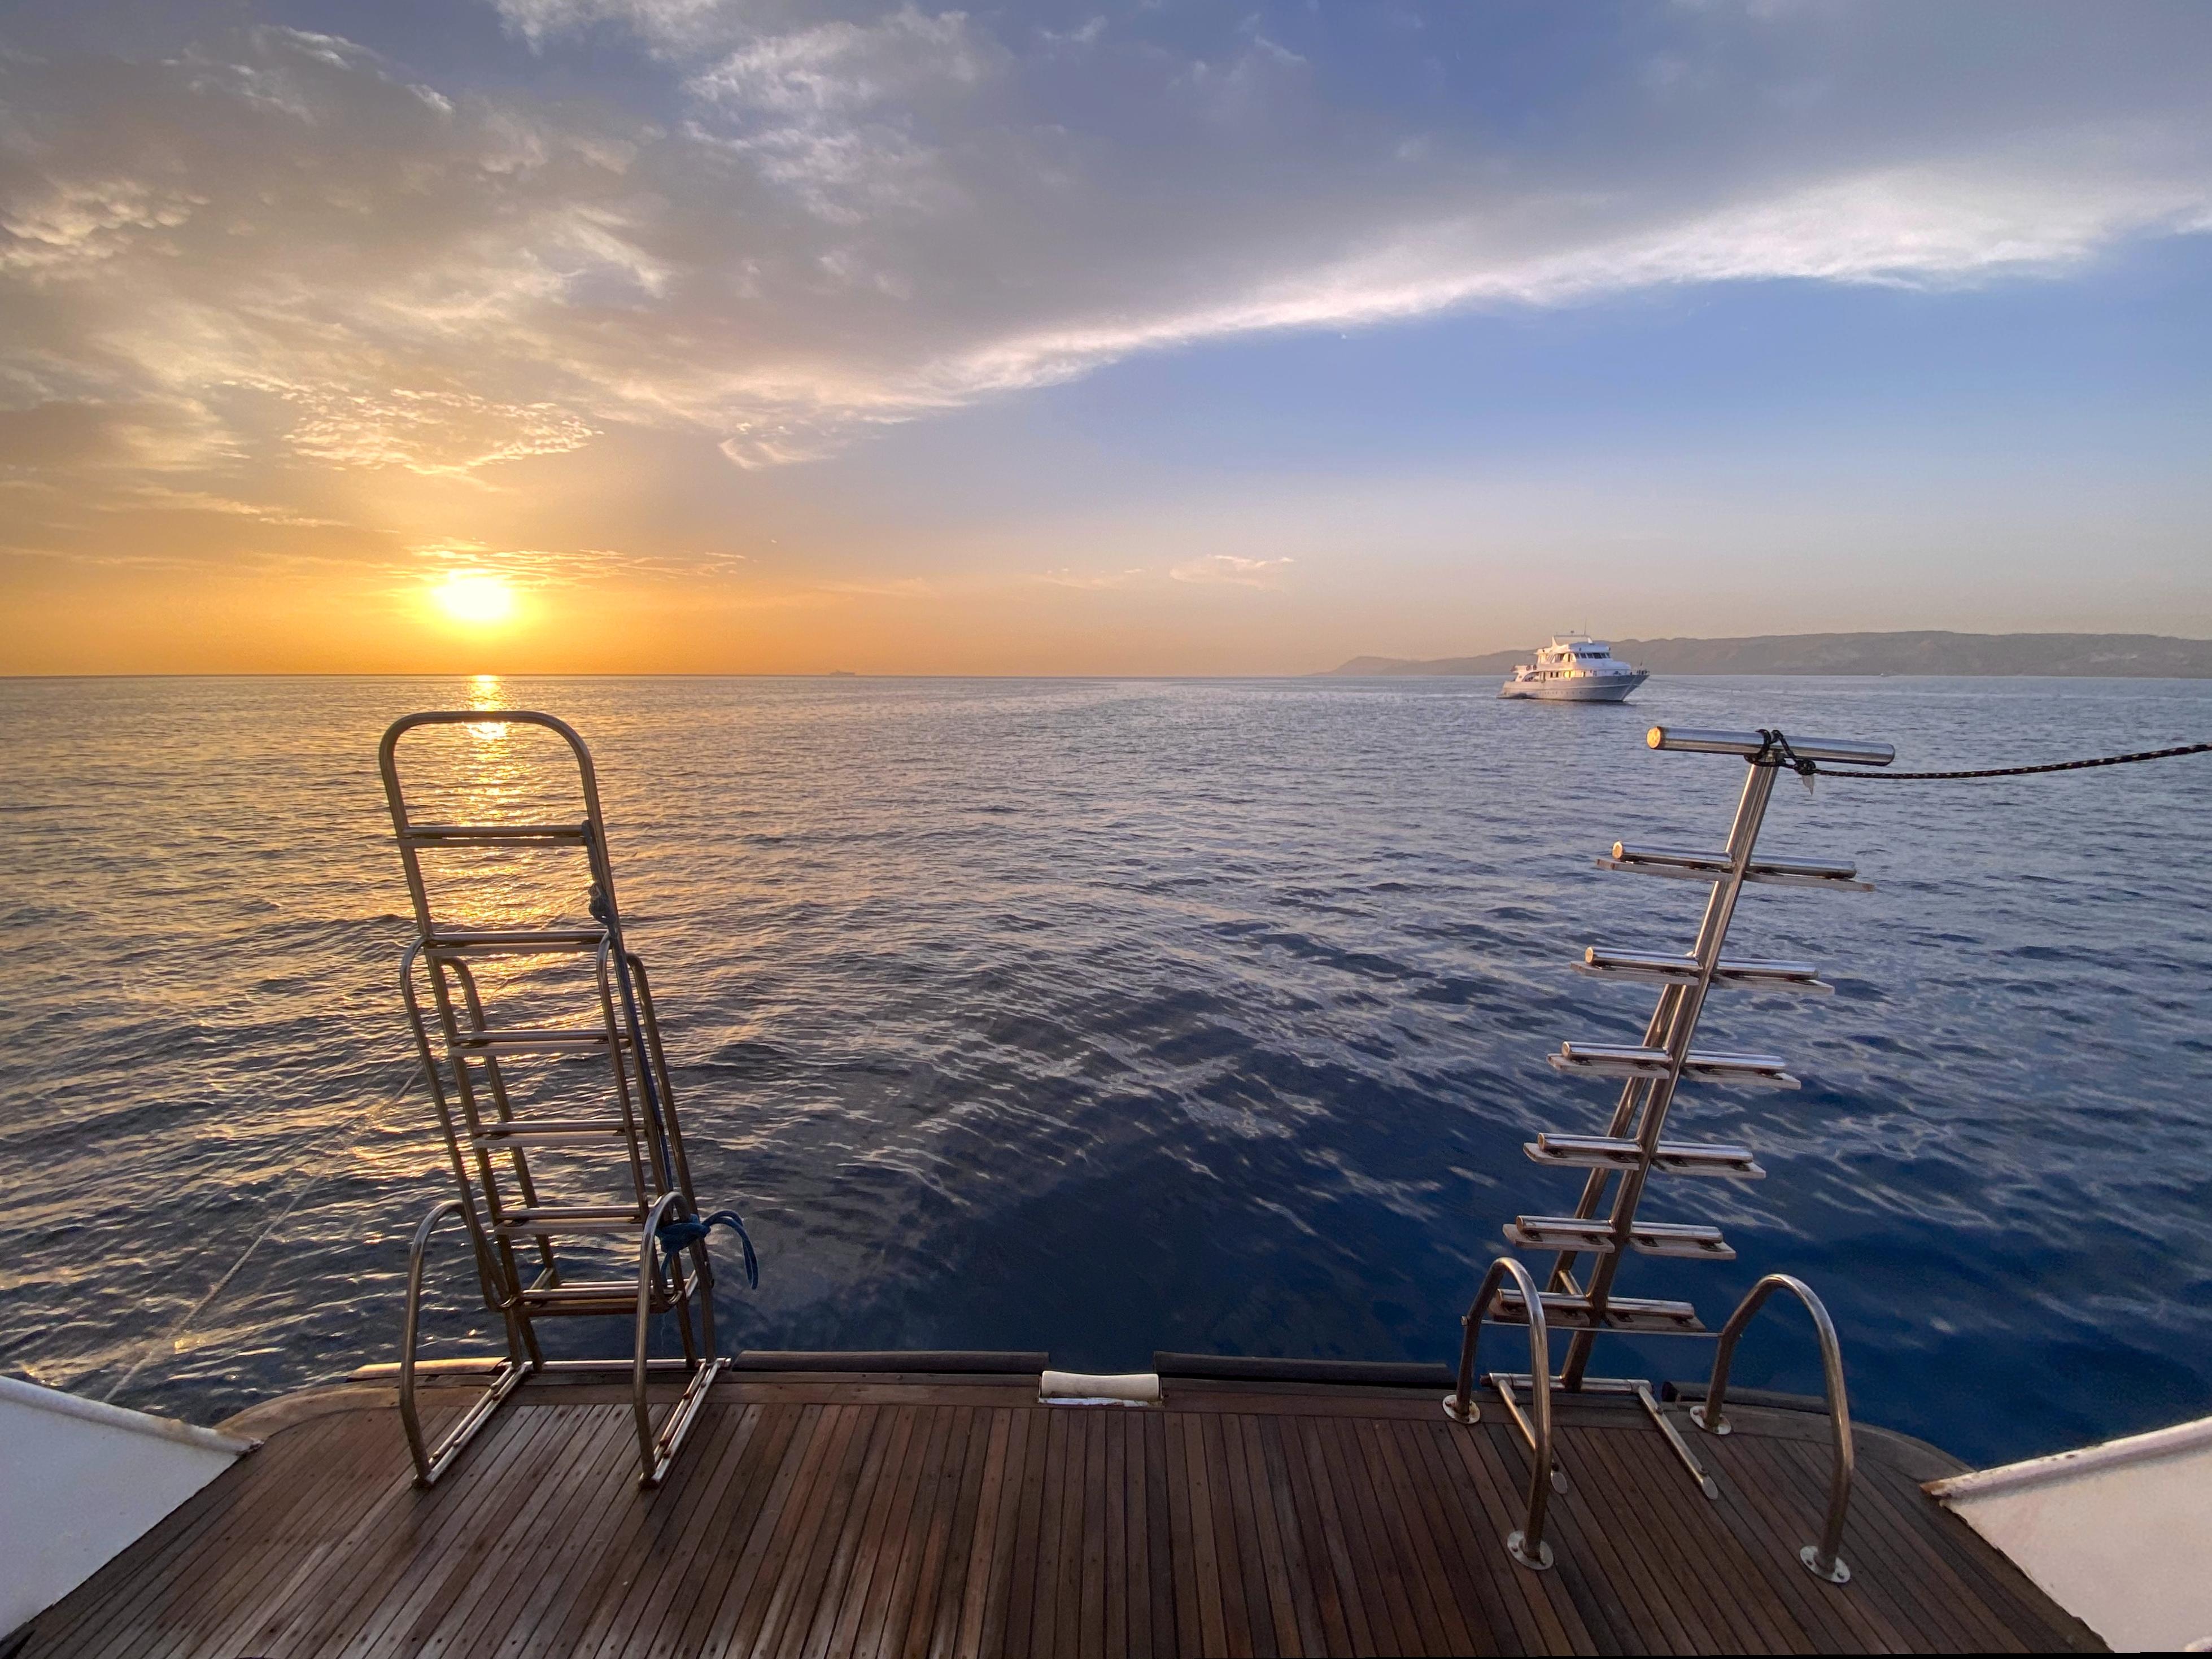 Minisafari Bahlul Sonnenuntergang